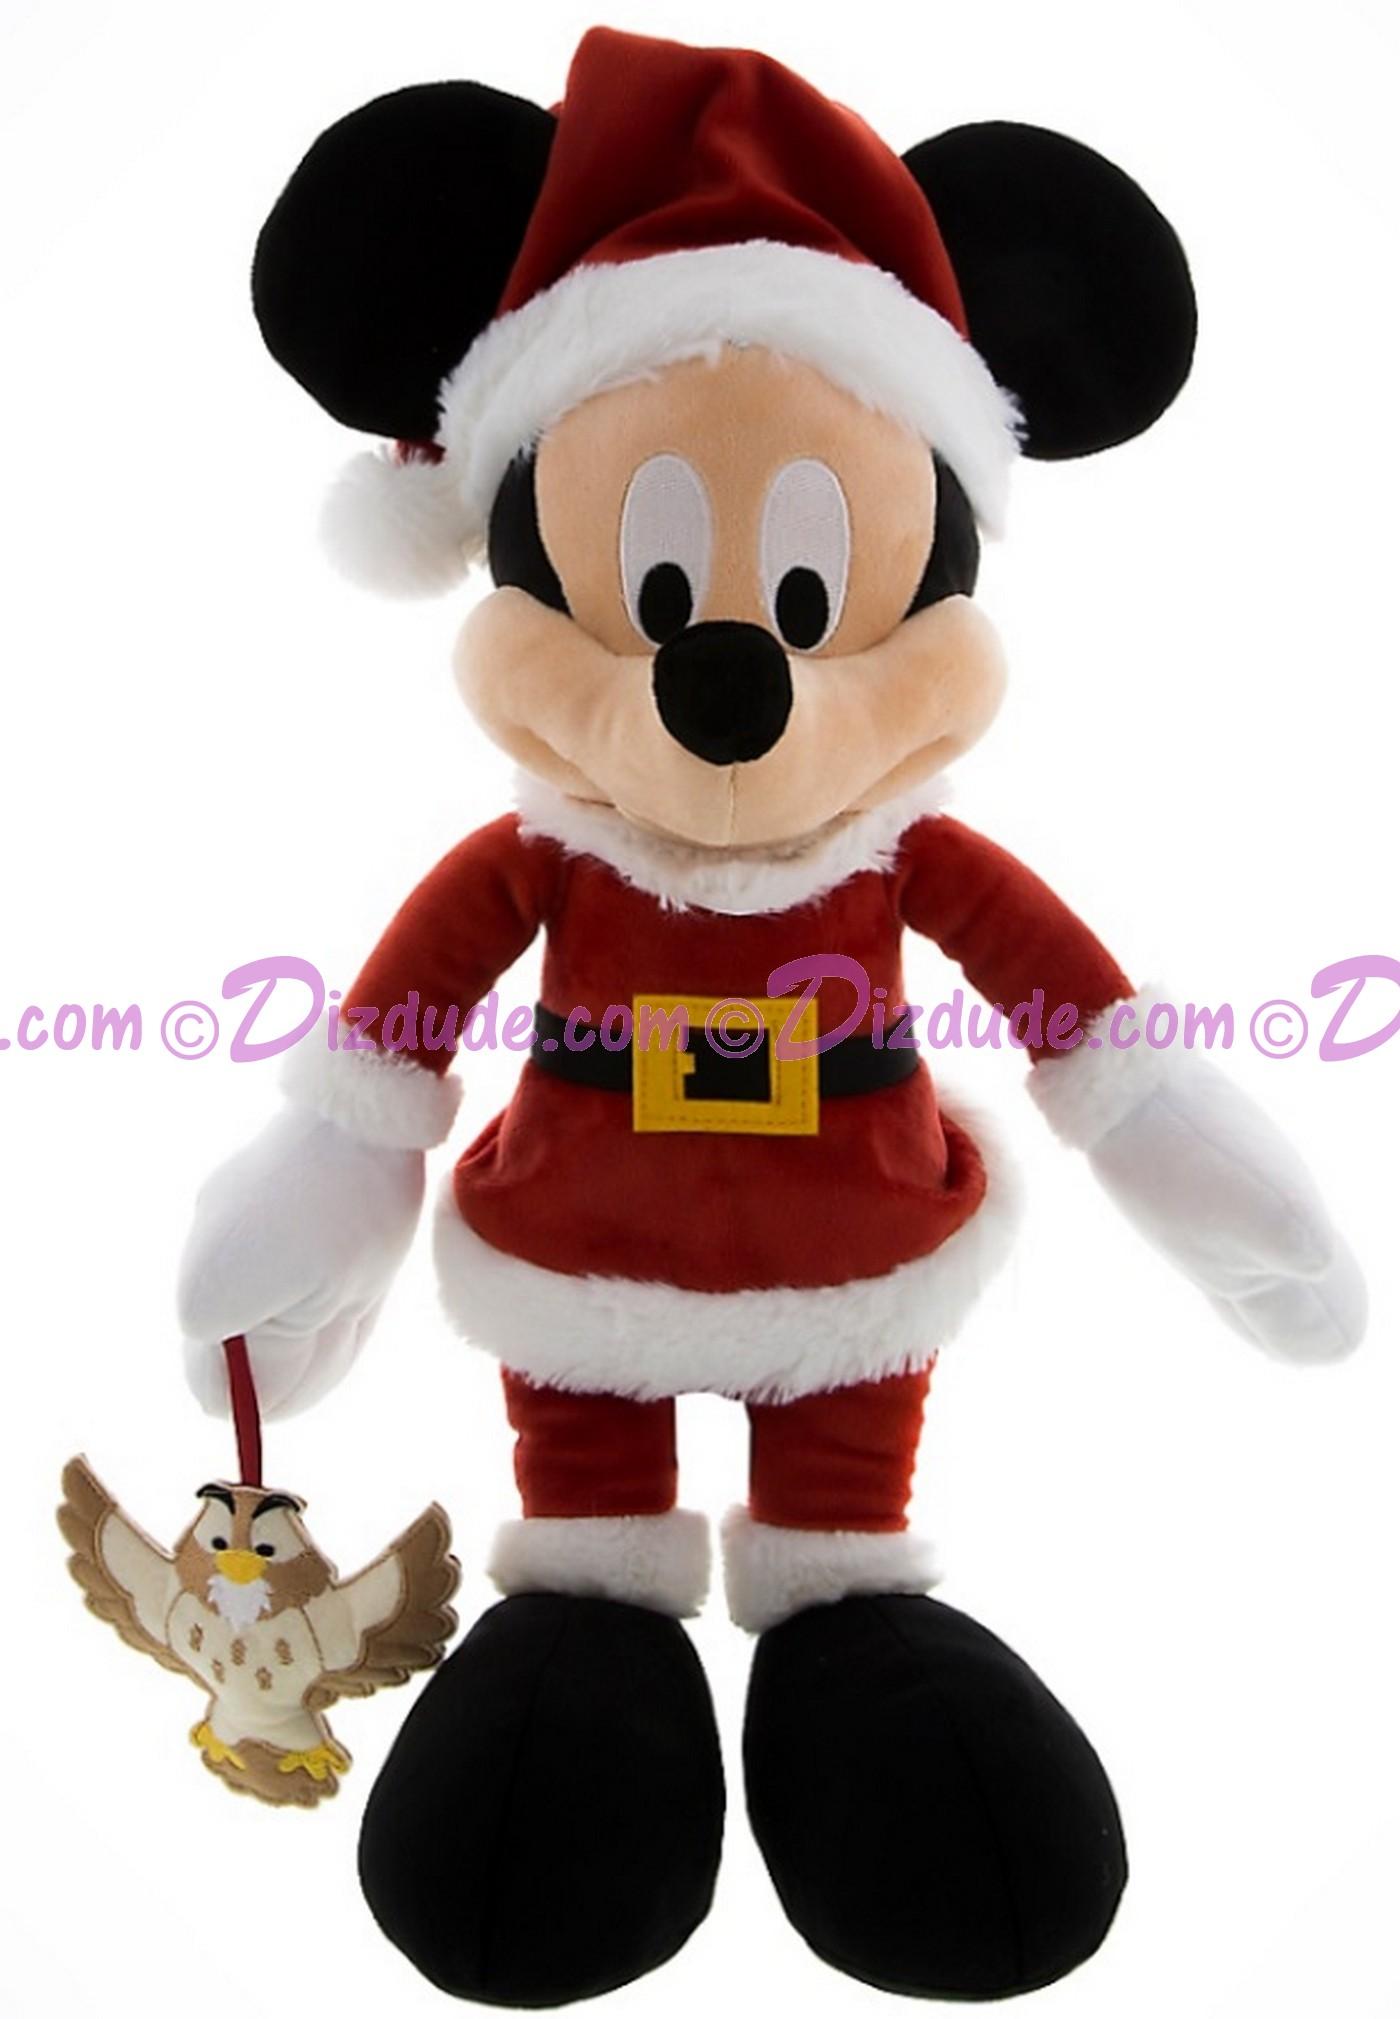 Disney Santa Mickey Mouse 15 inch Plush © Dizdude.com